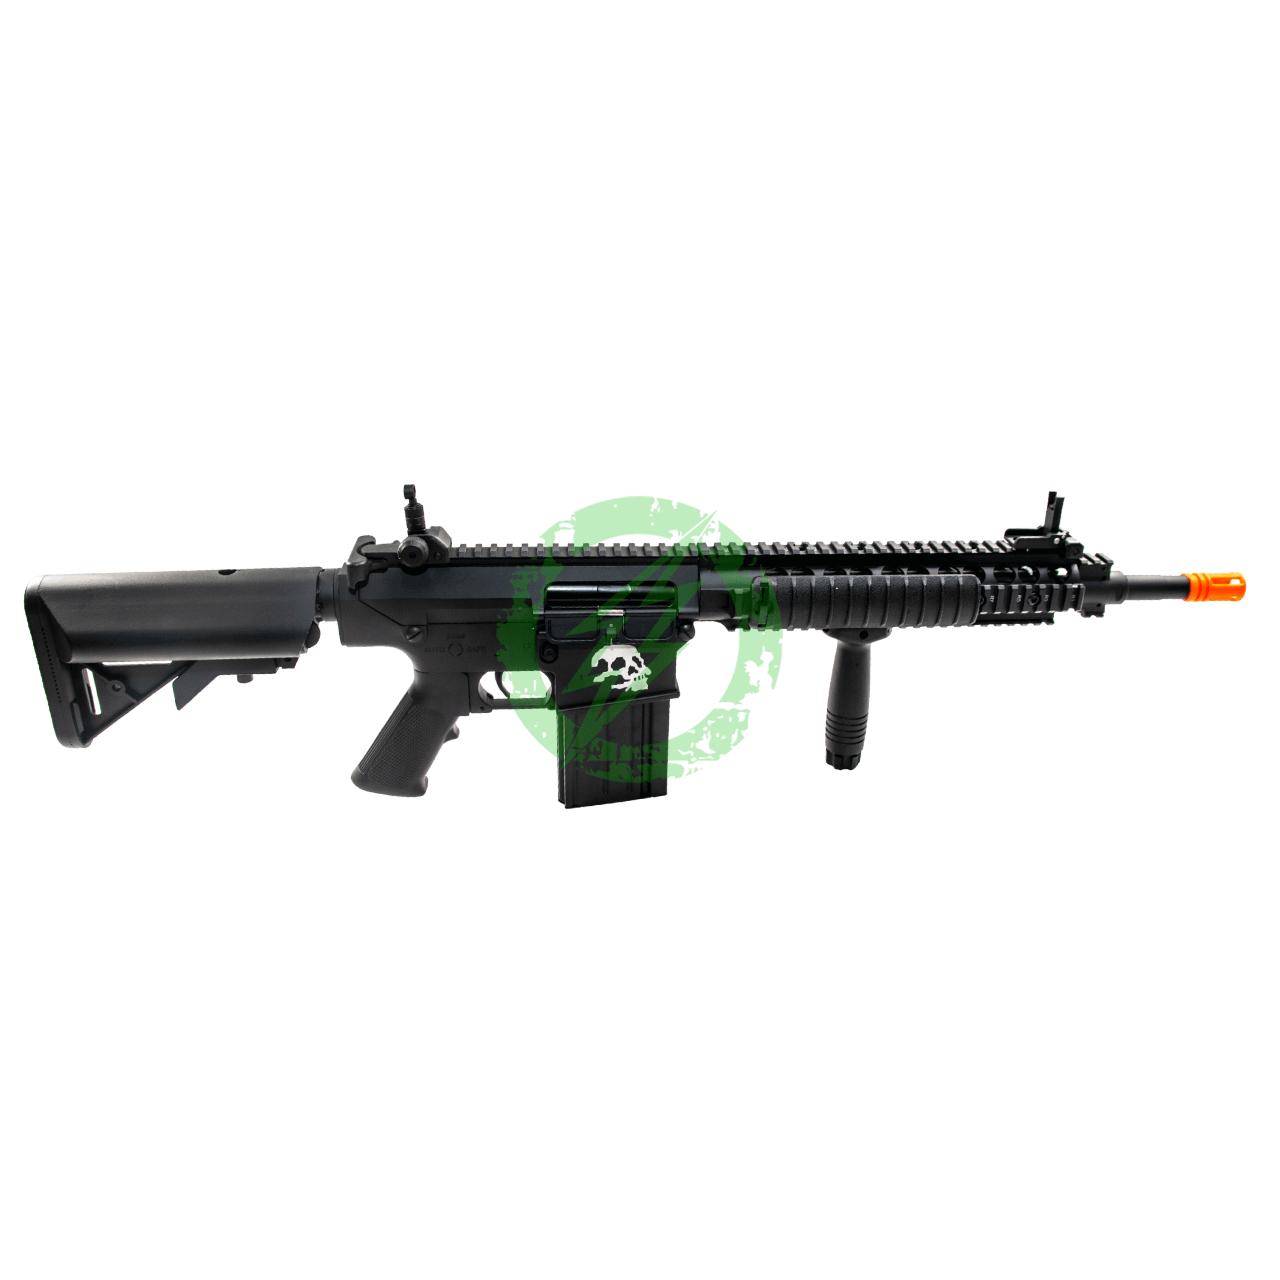 A&K Full Metal SR-25 Airsoft AEG Rifle | Zombie Killer Edition right